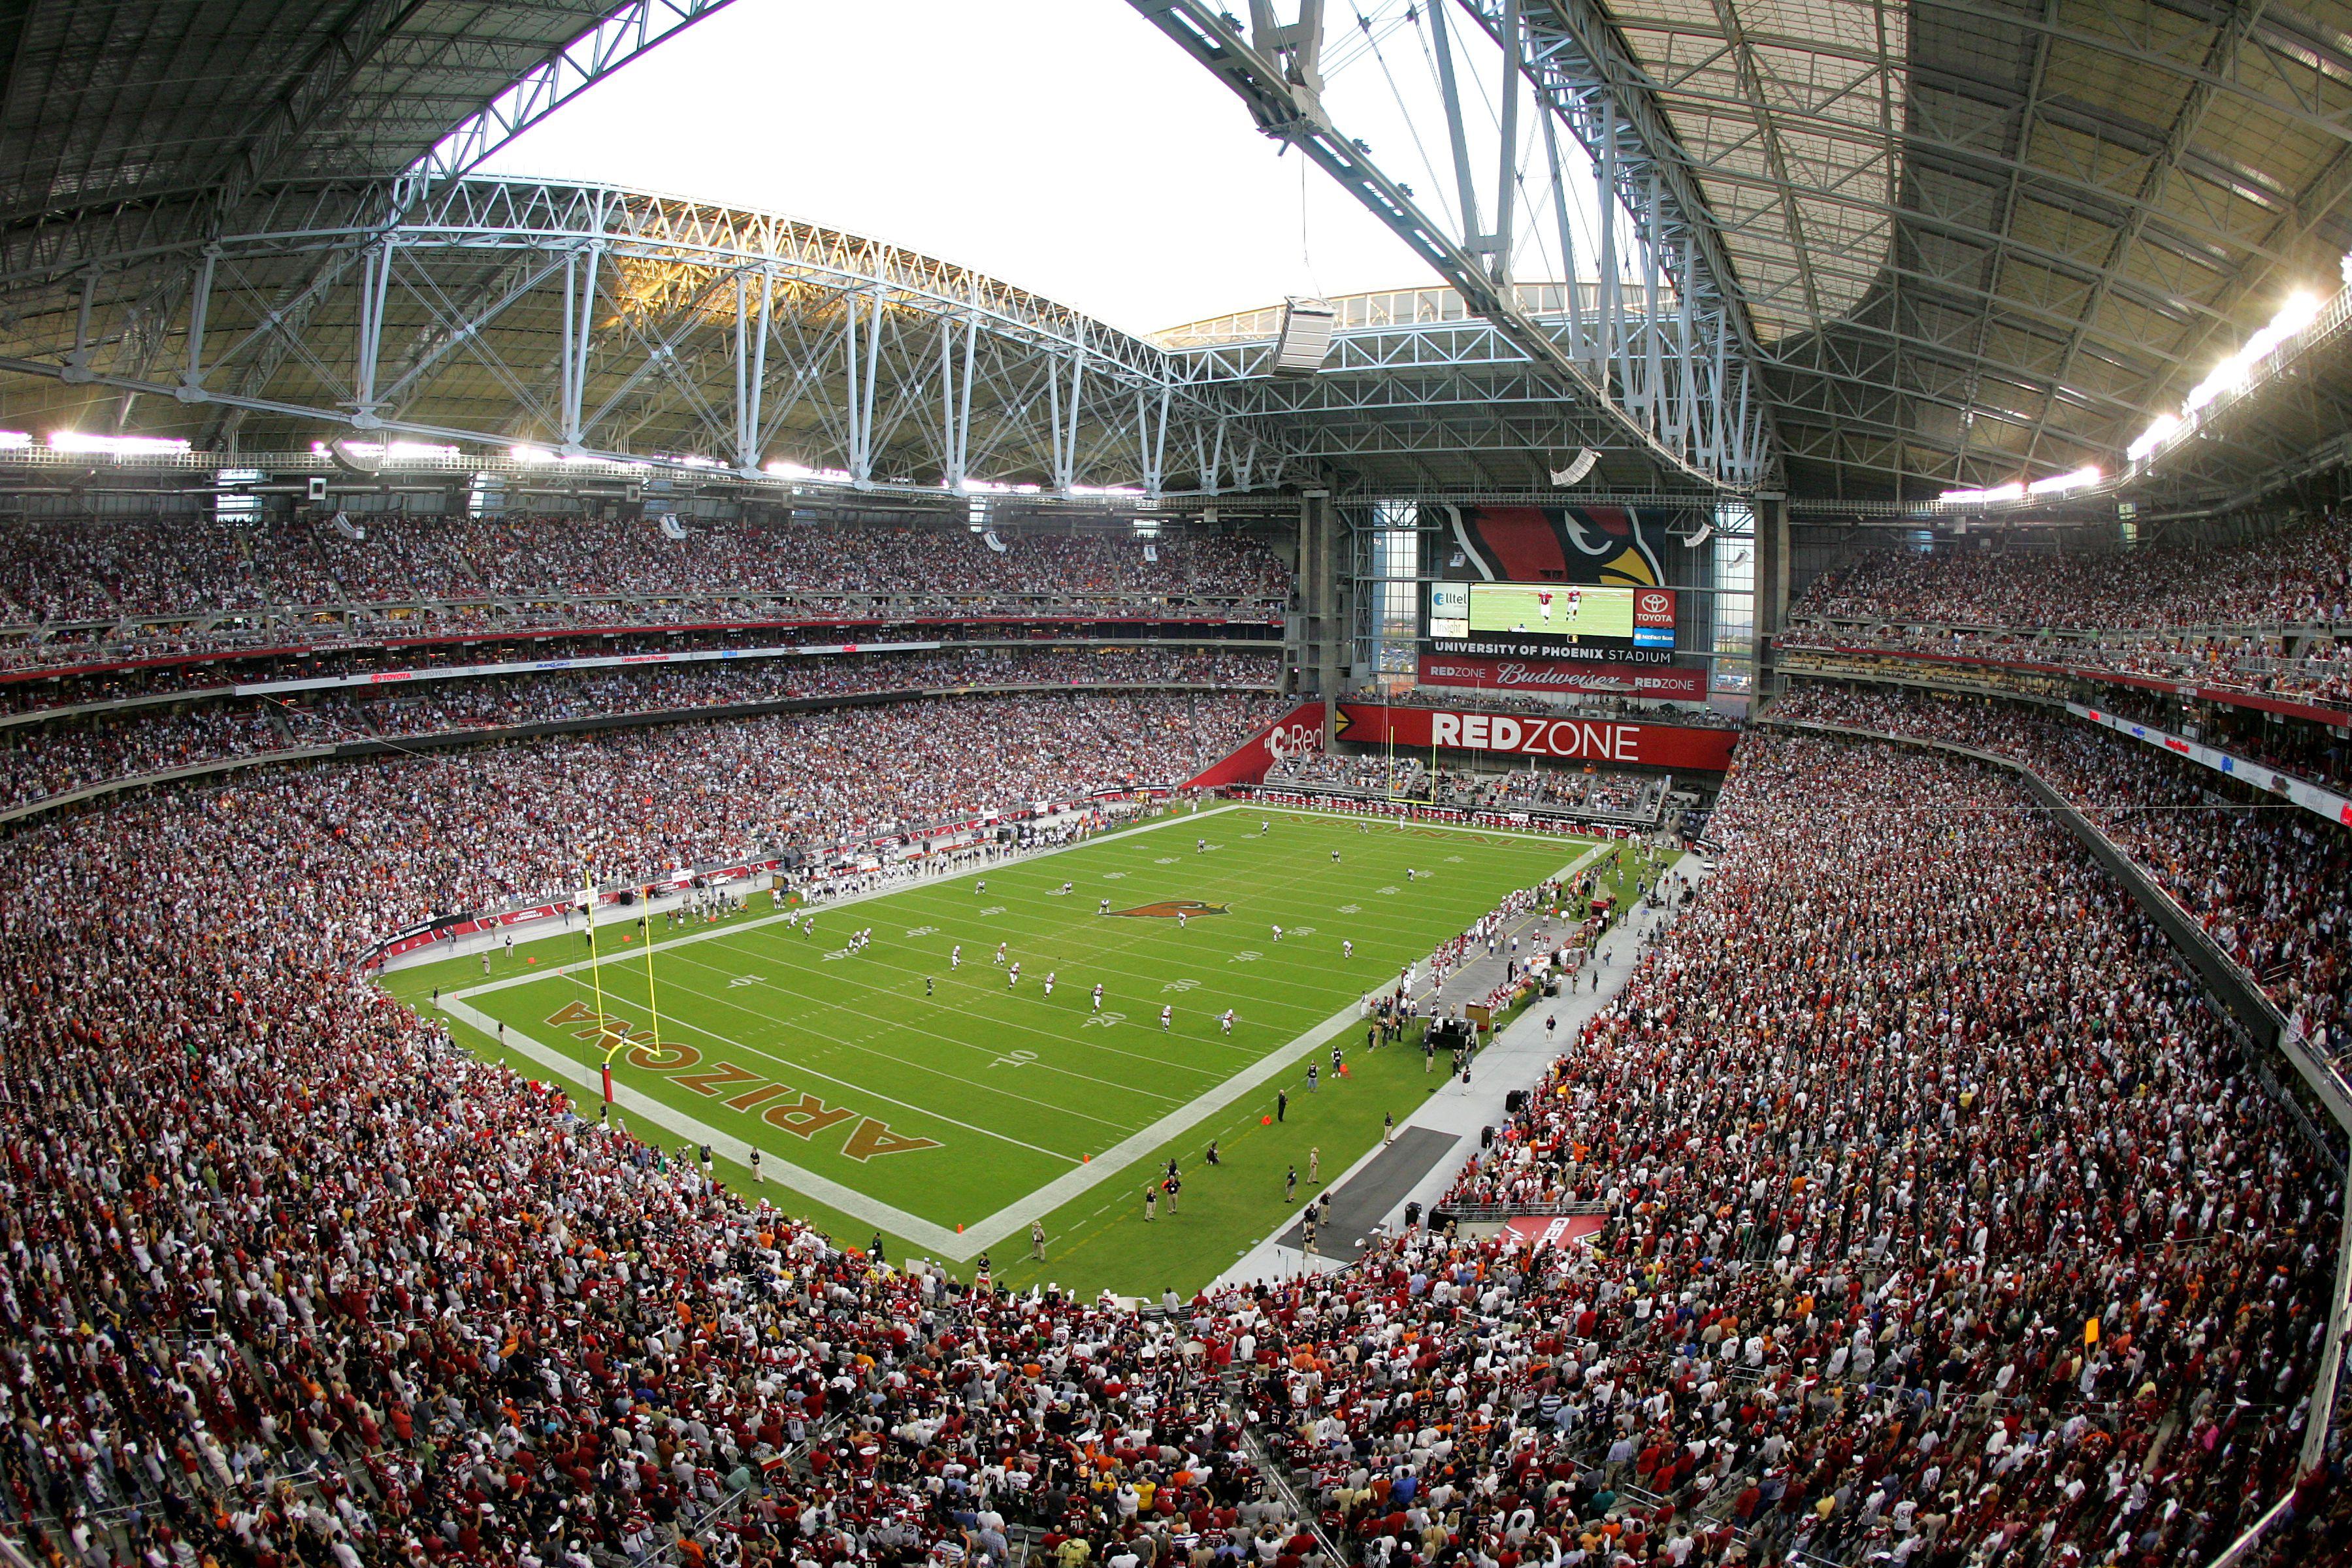 Inside University of Phoenix Stadium in Glendale, Arizona, in 2006 with the roof open